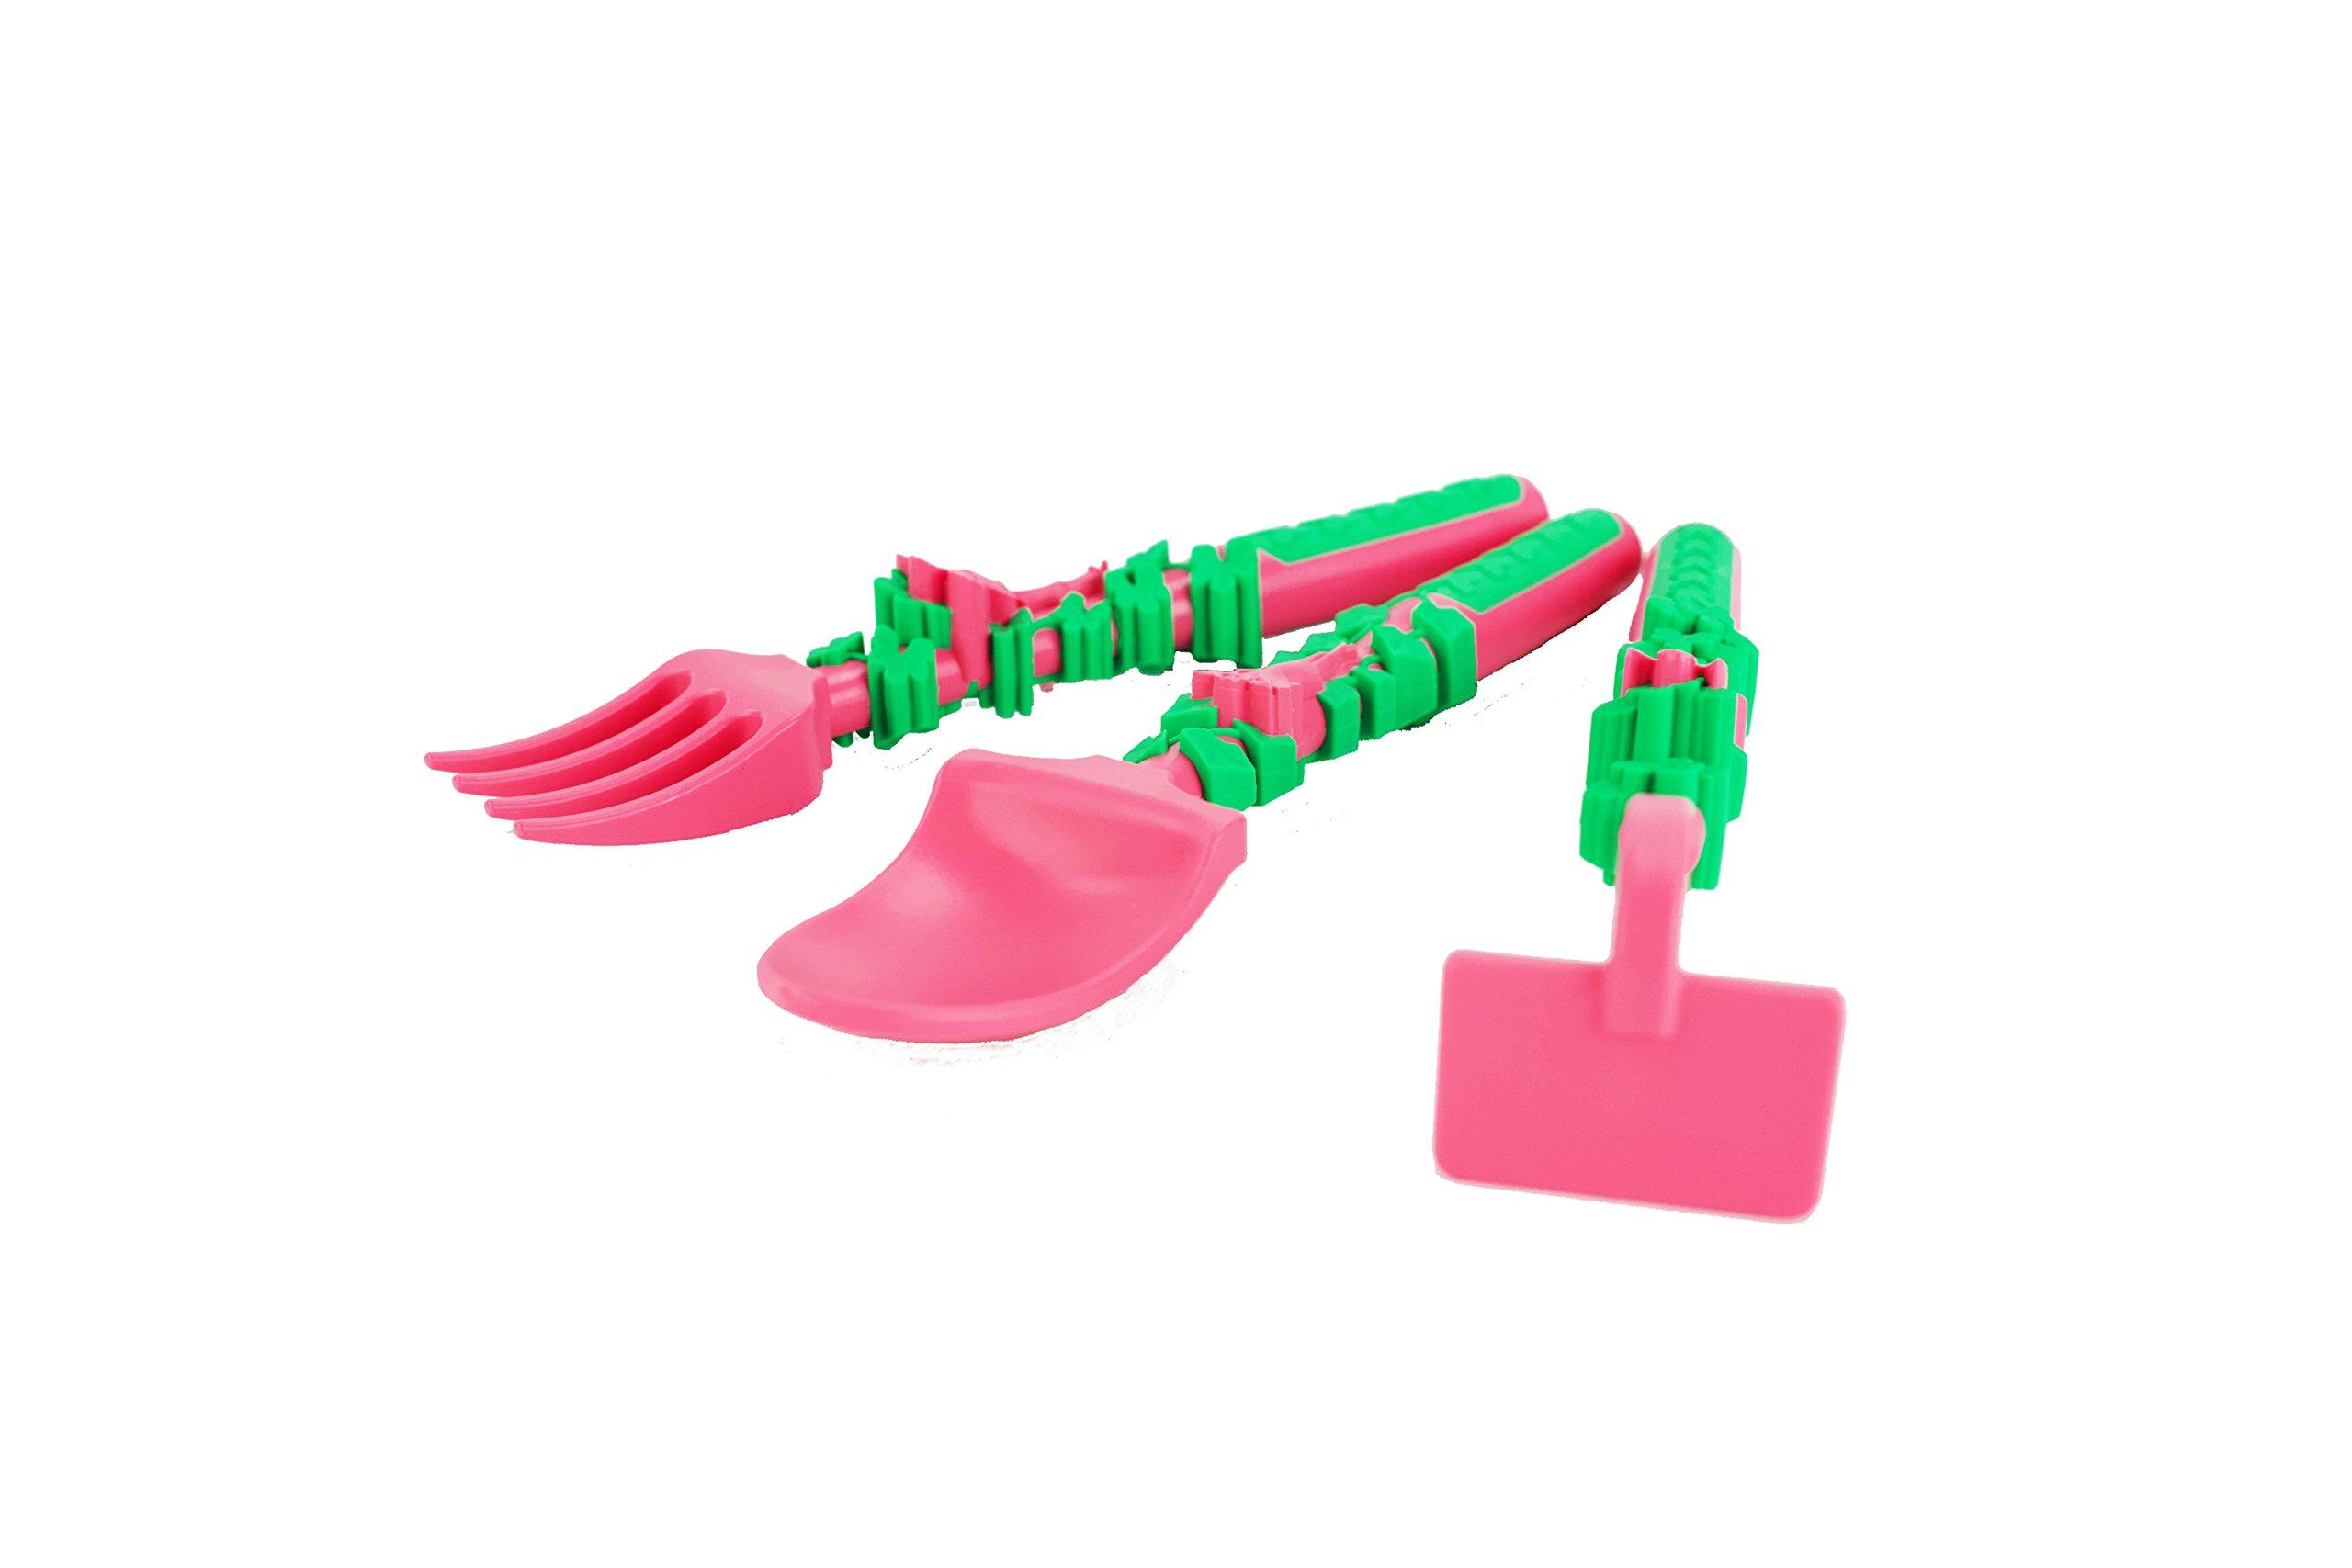 Amazon.com : Constructive Eating - Set of Construction Utensils : Baby Flatware Sets : Baby